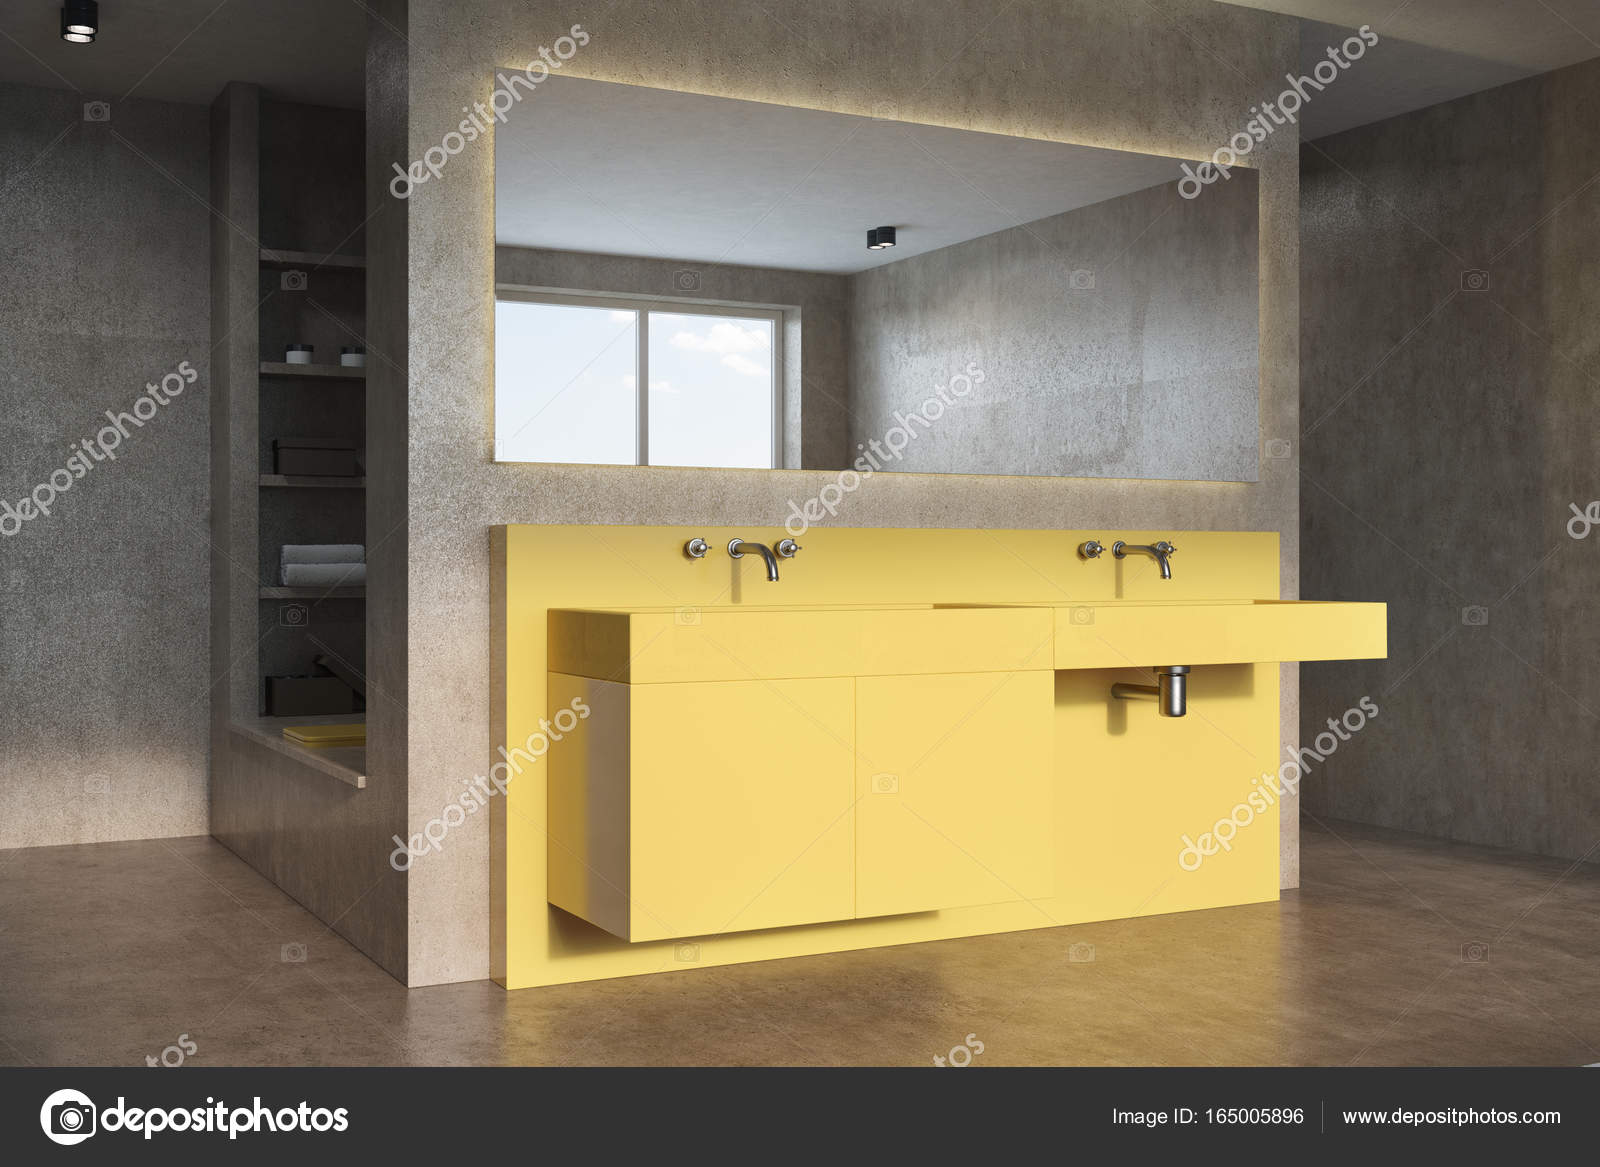 Hoek Wasbak Badkamer : Betonnen gele wastafel badkamer hoek u stockfoto